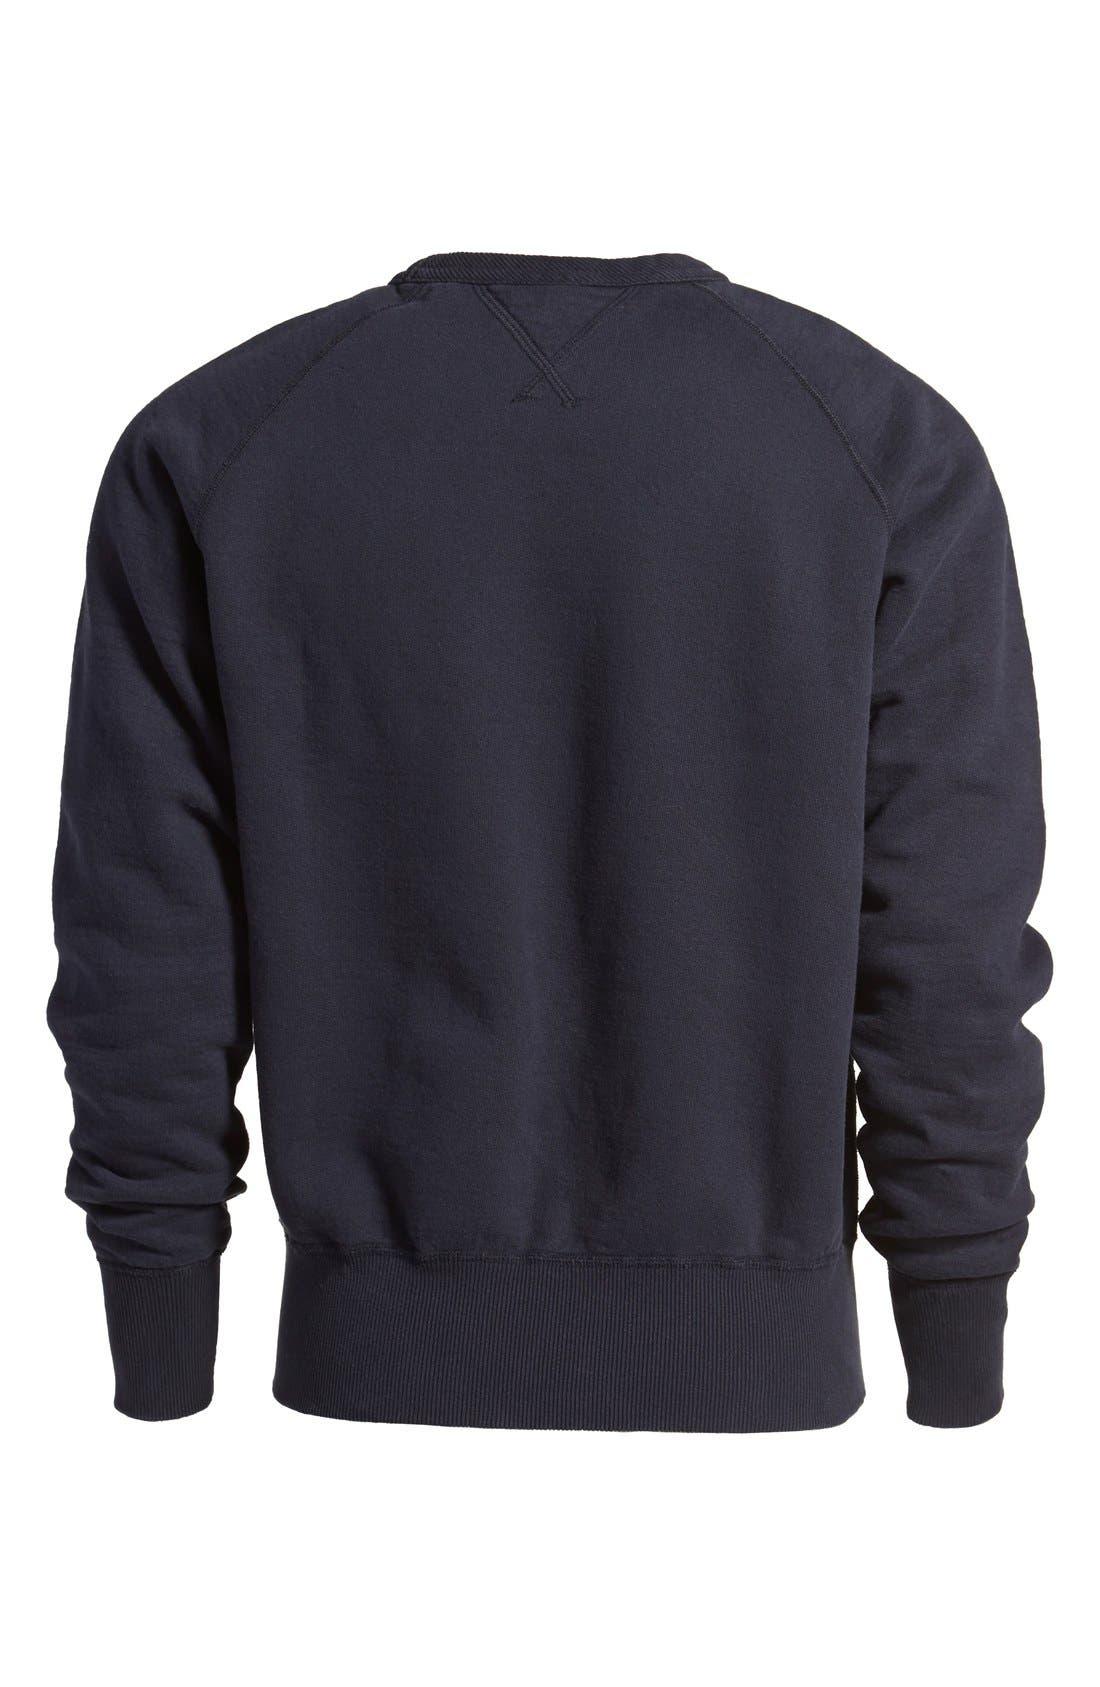 BEST MADE CO.,                             Best Made Co '20 oz. Standard' Sweatshirt,                             Alternate thumbnail 3, color,                             400